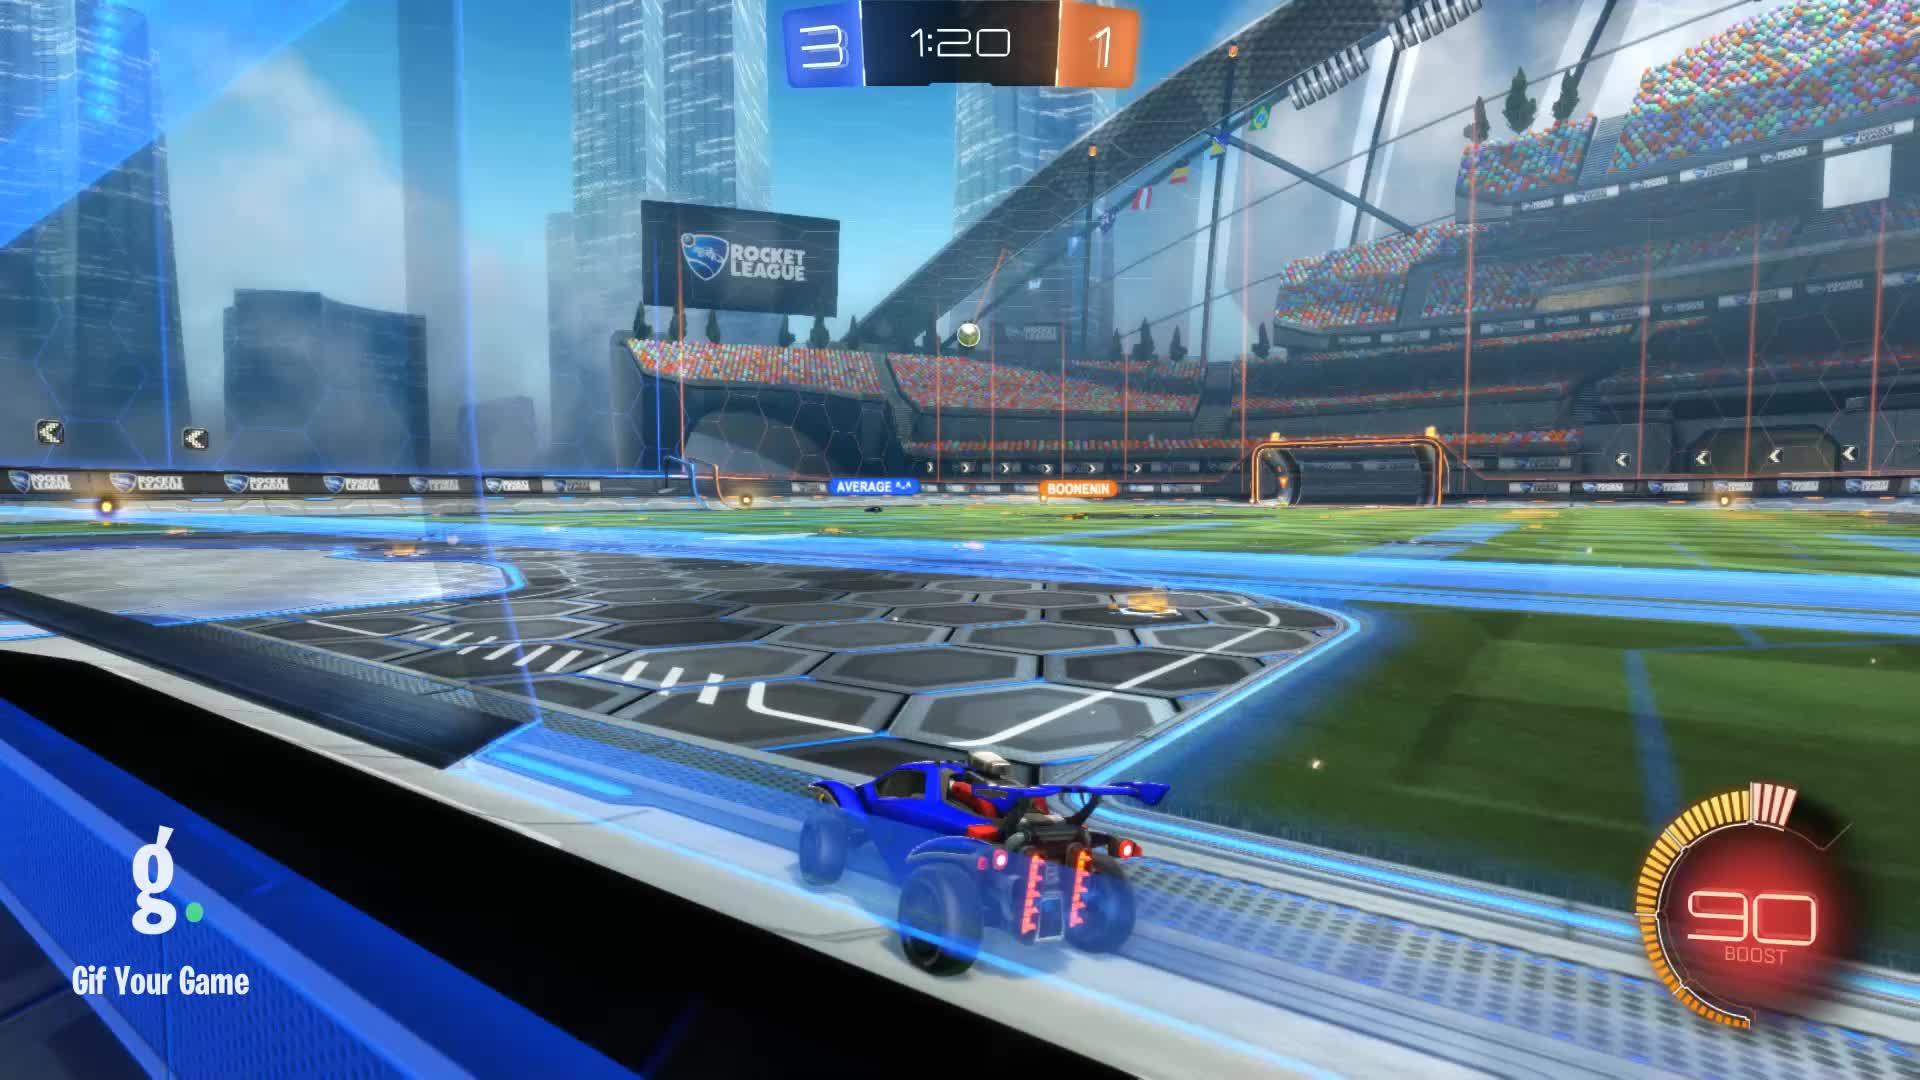 Gif Your Game, GifYourGame, Goal, Rocket League, RocketLeague, datboi, Goal 5: datboi GIFs